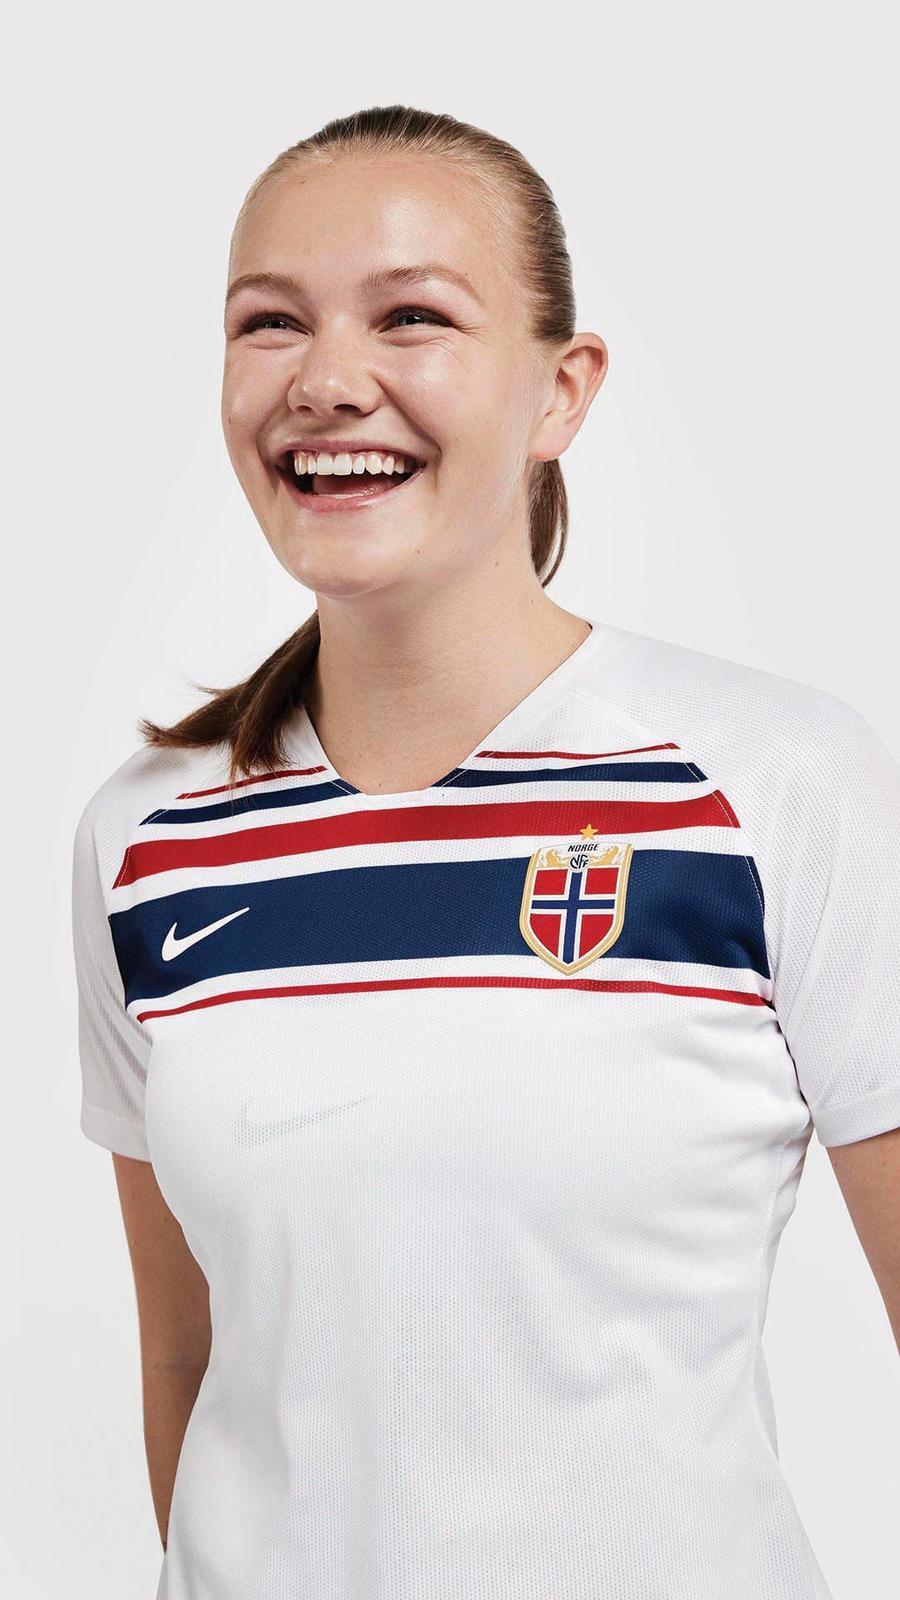 Nike-National-Team-Kit-Norway-Away-Portrait-Web-frida-maanum_86164.jpg